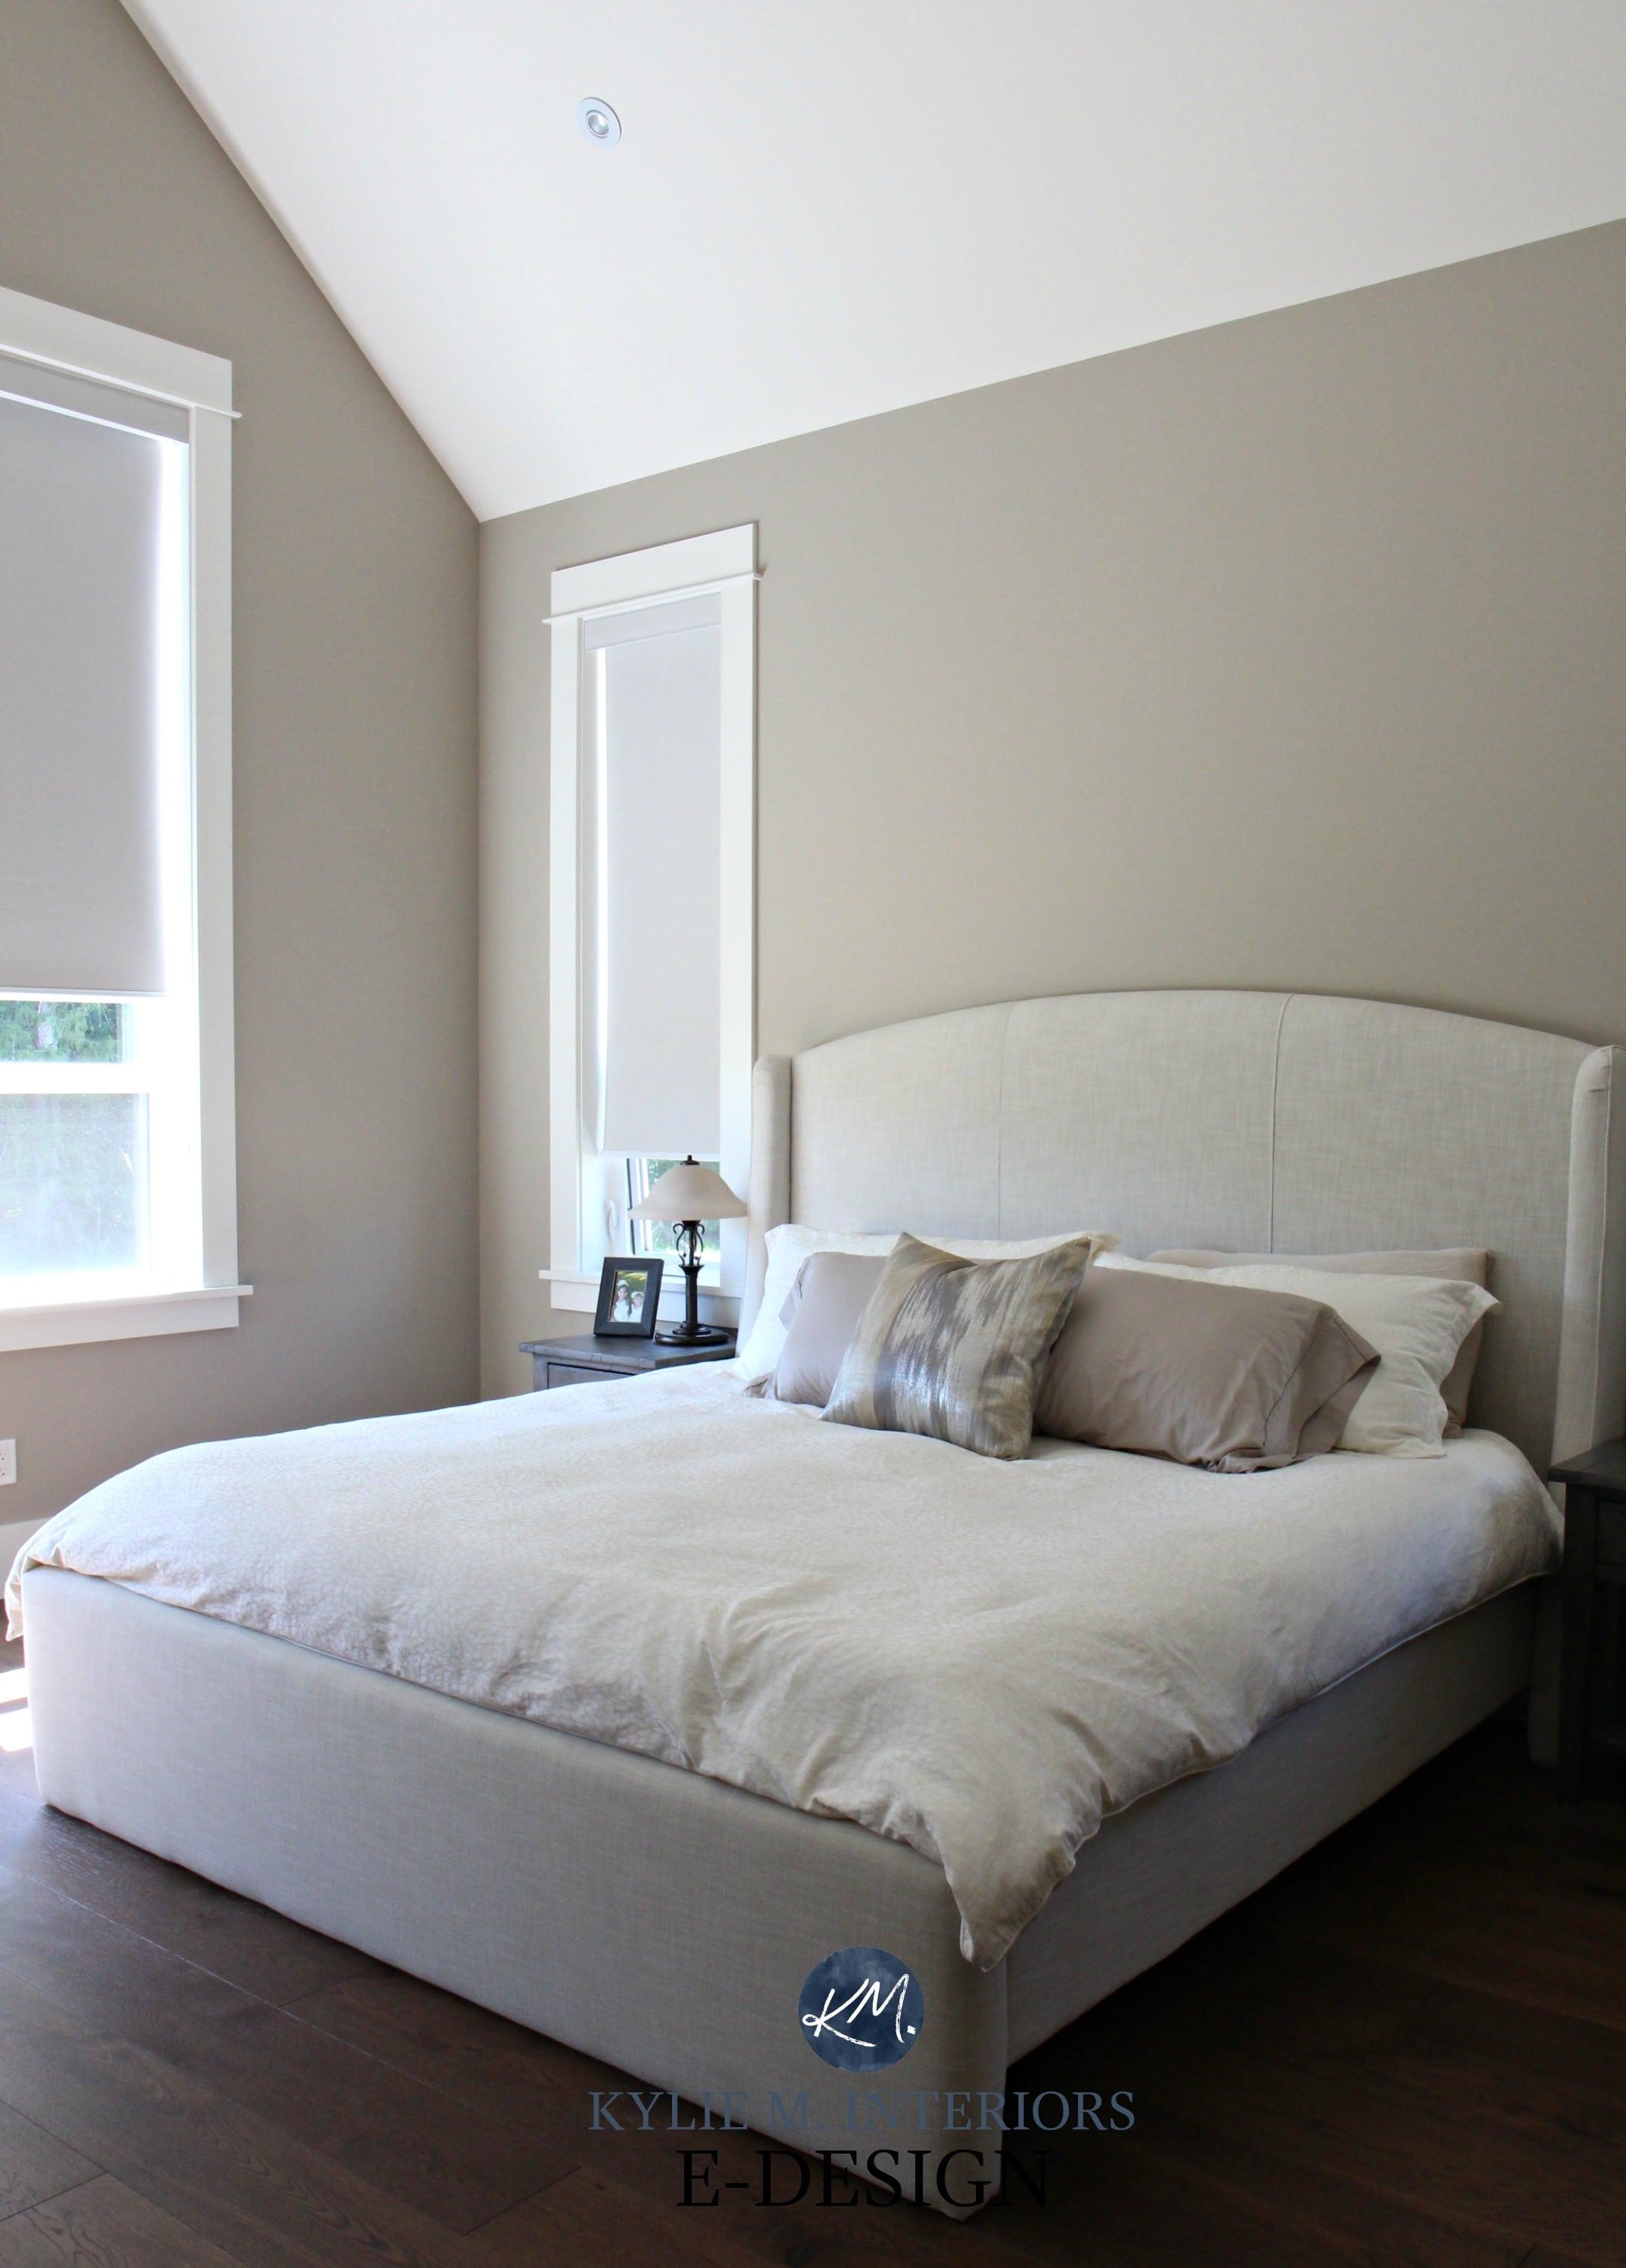 sherwin williams balanced beige mushroom paint color on paint colors online id=93639